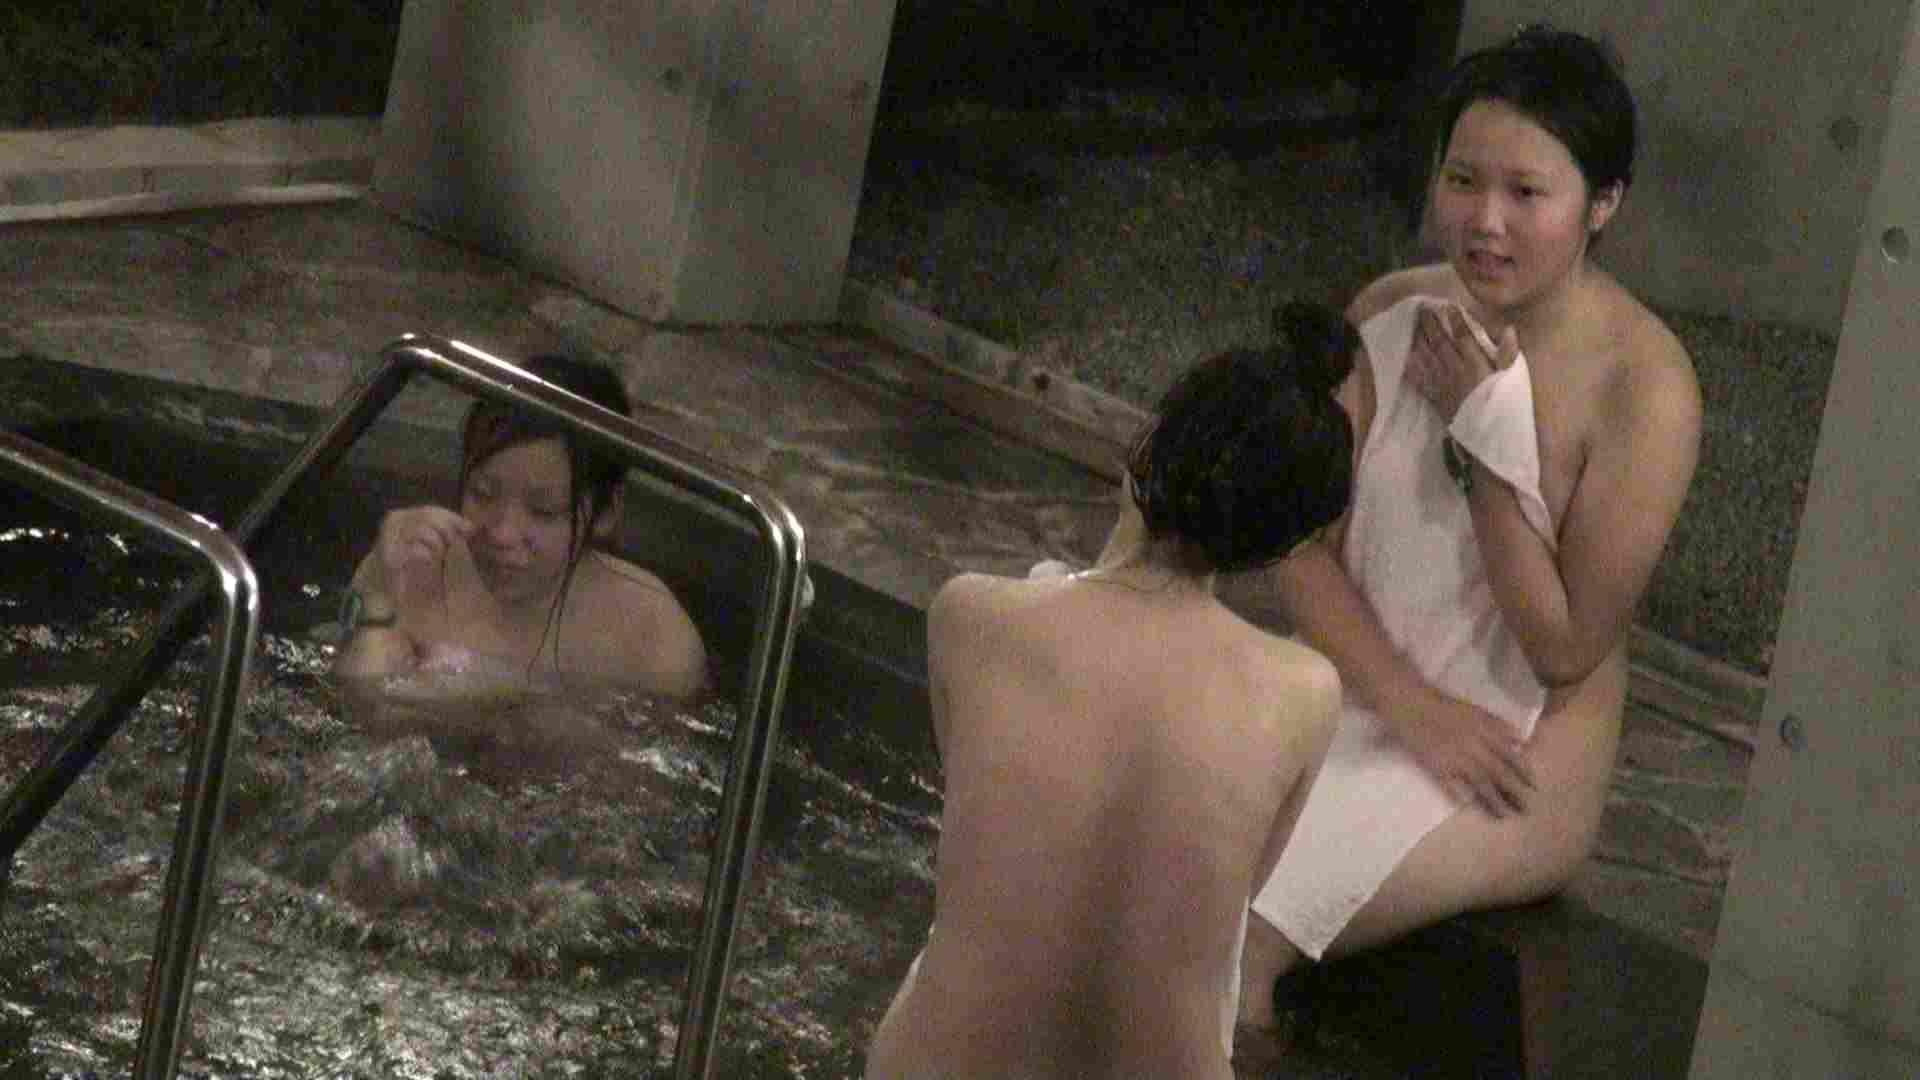 Aquaな露天風呂Vol.383 OLセックス 覗き性交動画流出 103画像 29